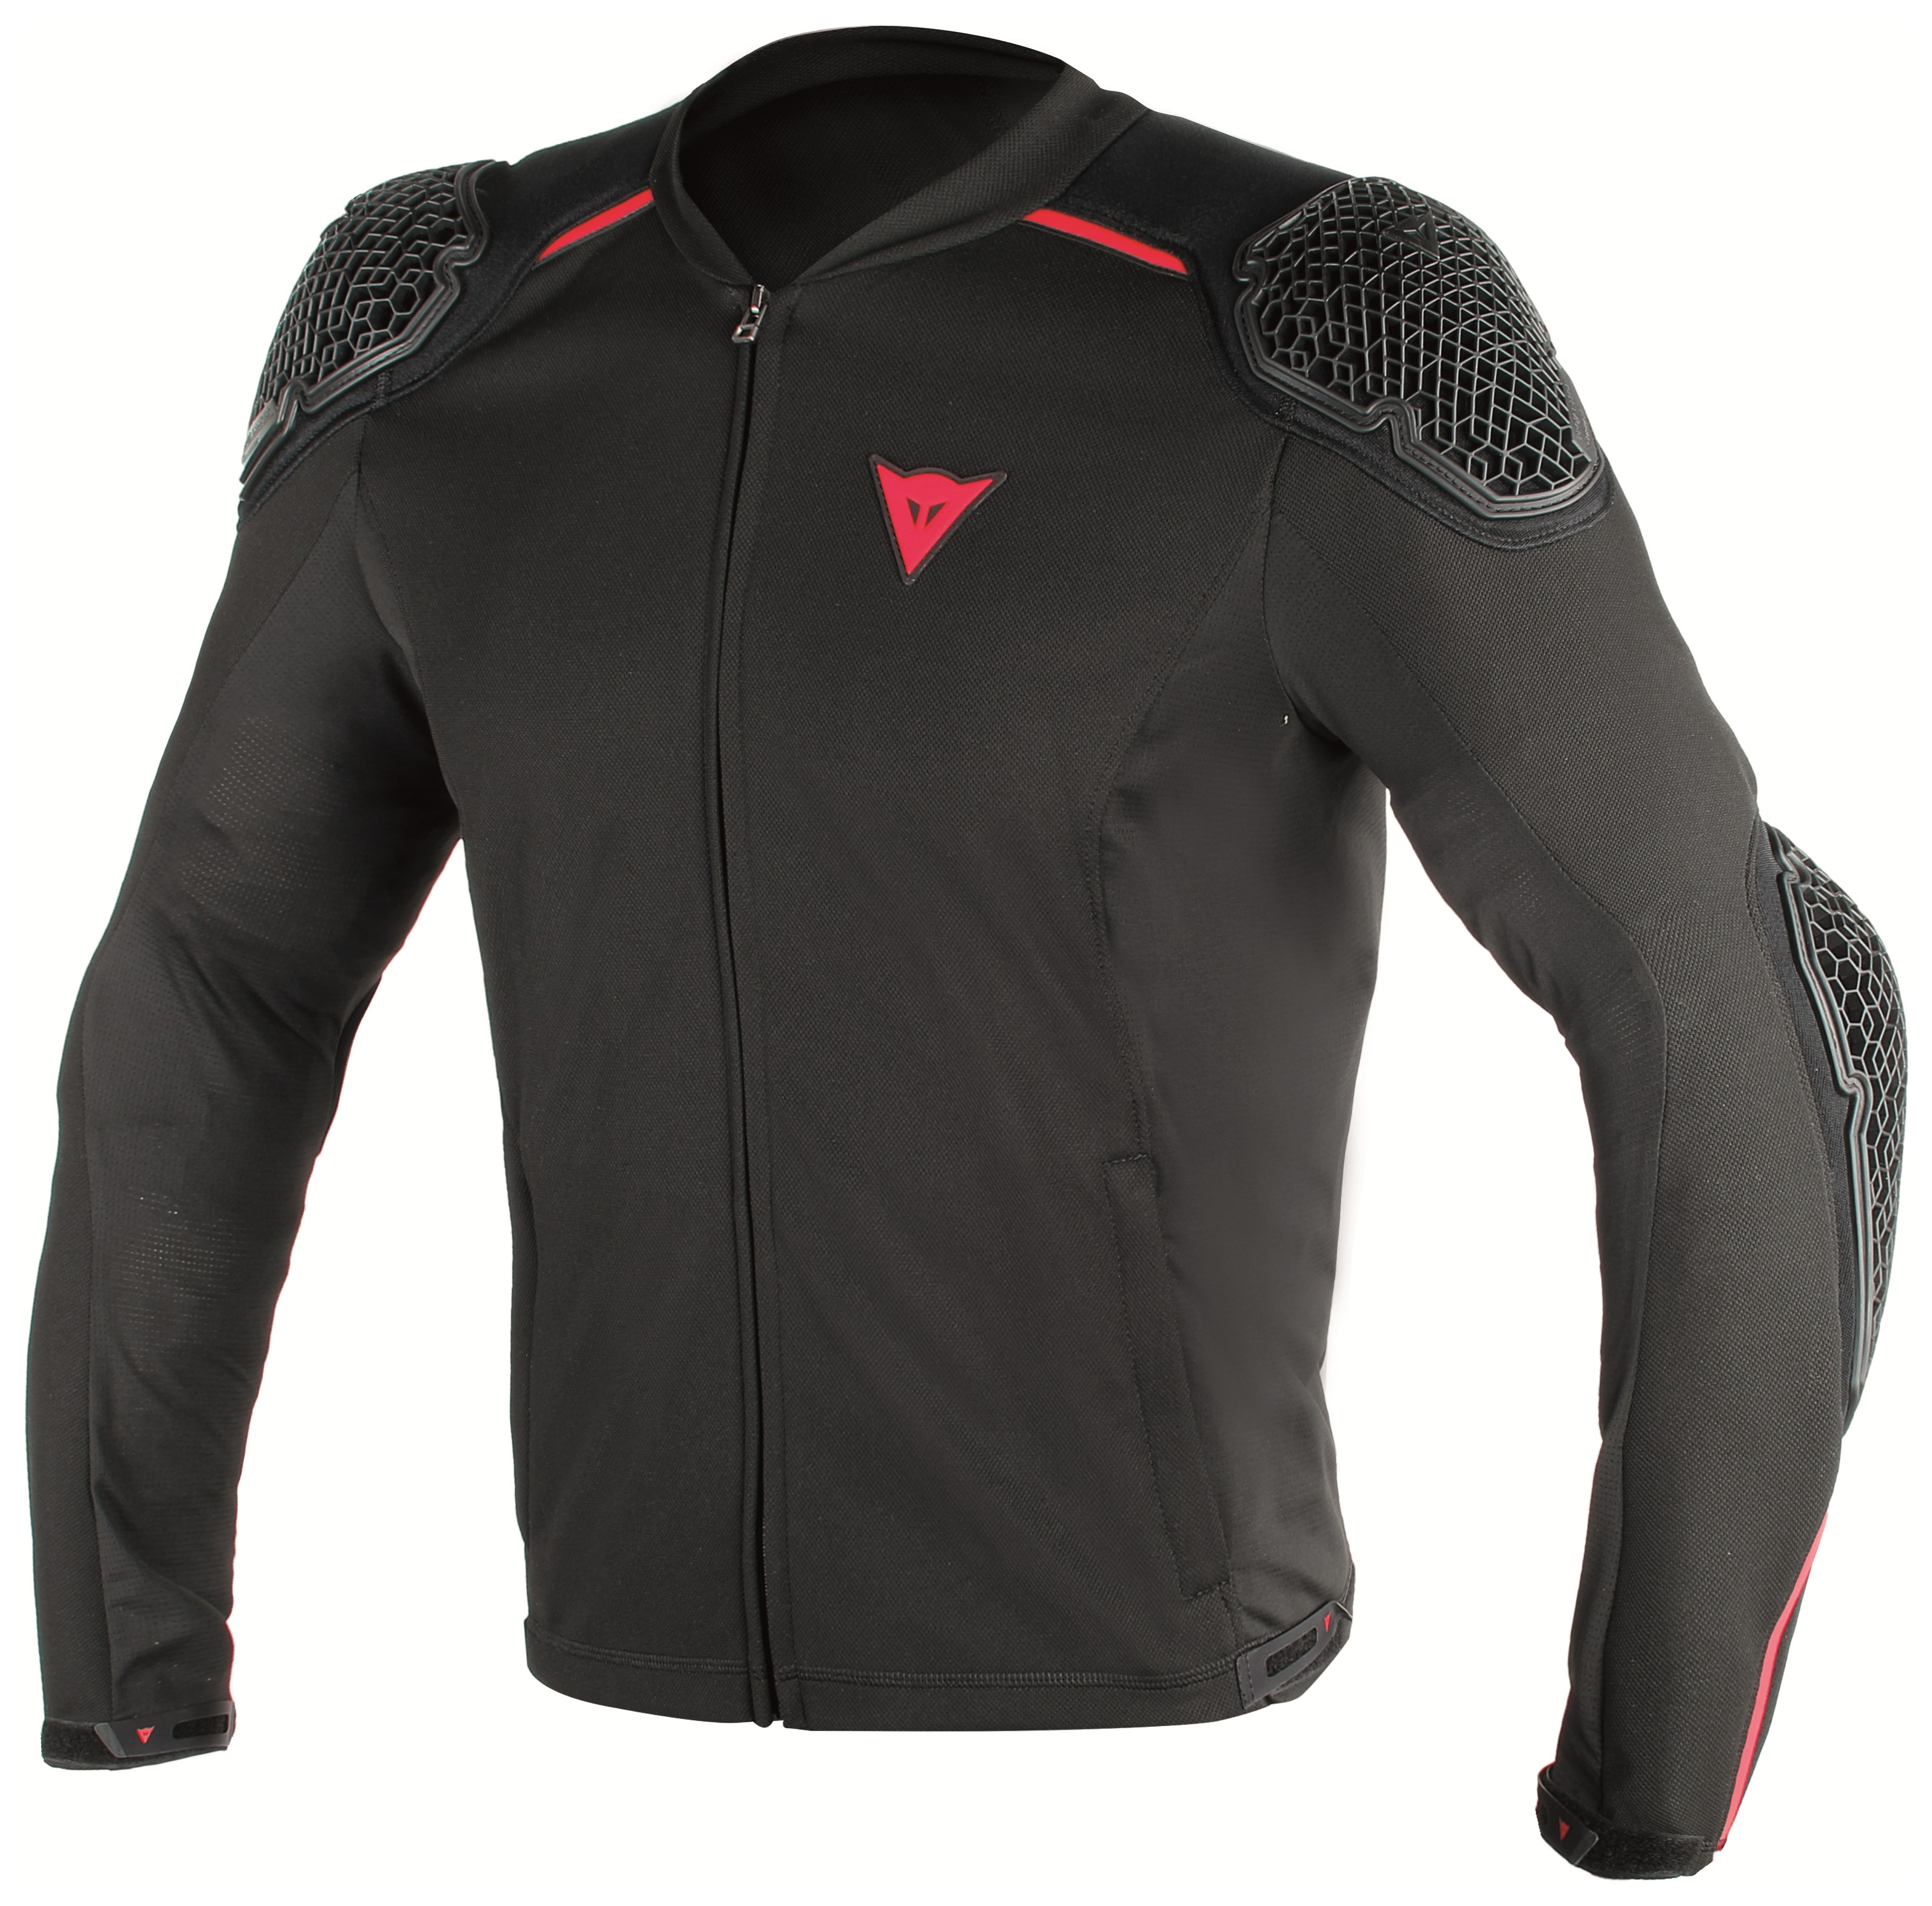 Dainese Pro Armor Jacket Revzilla